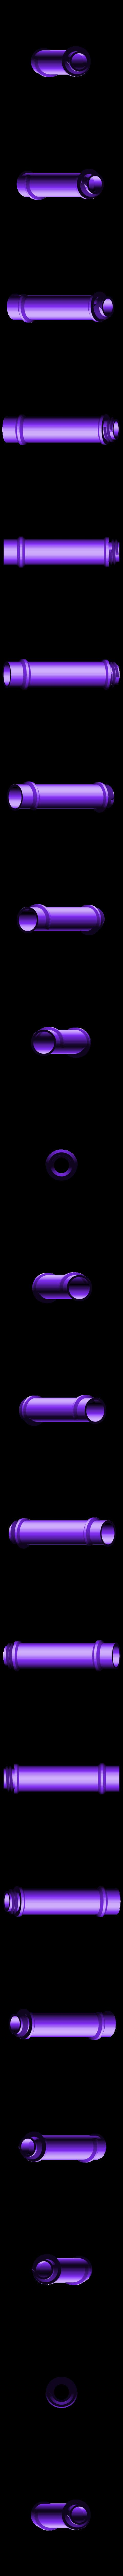 hammer-rod.stl Download free STL file Fix It Felix Hammer • 3D printer design, Adafruit